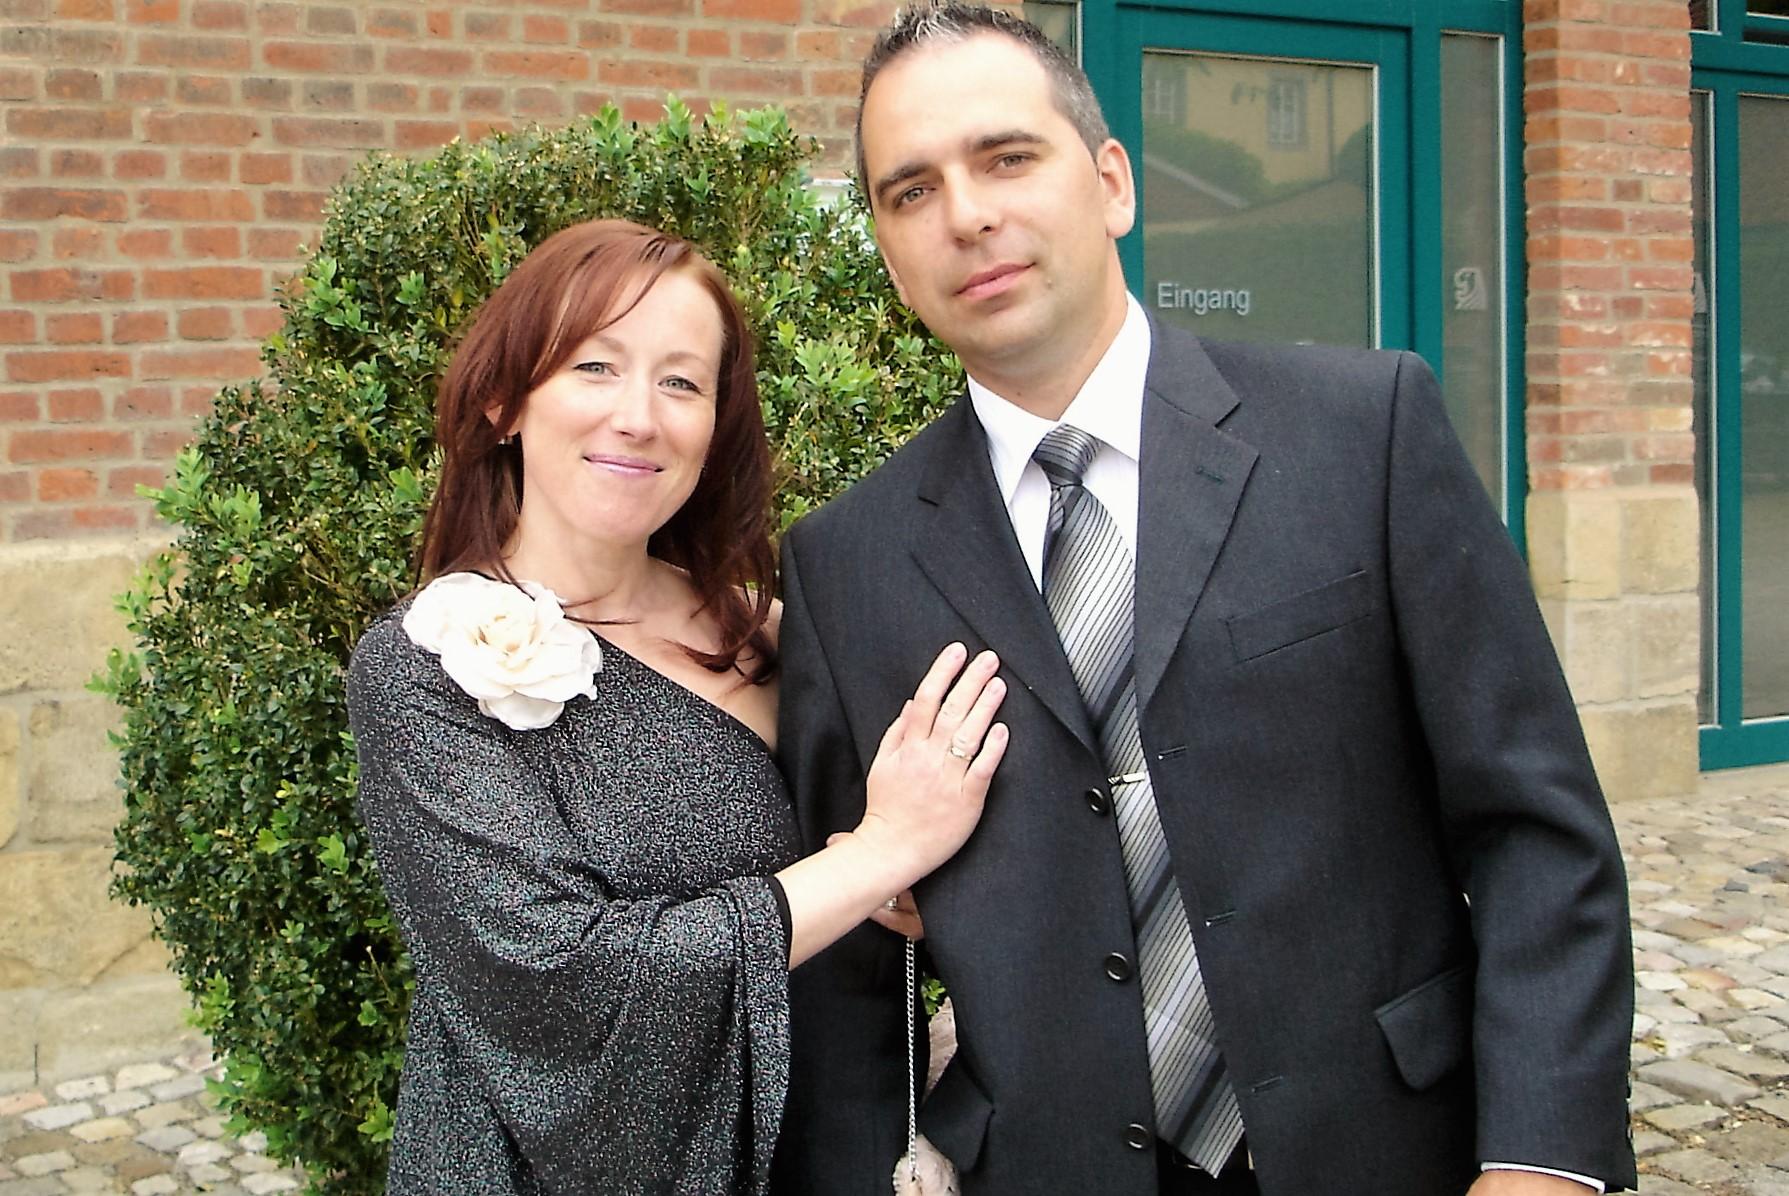 Herr und Frau Benke